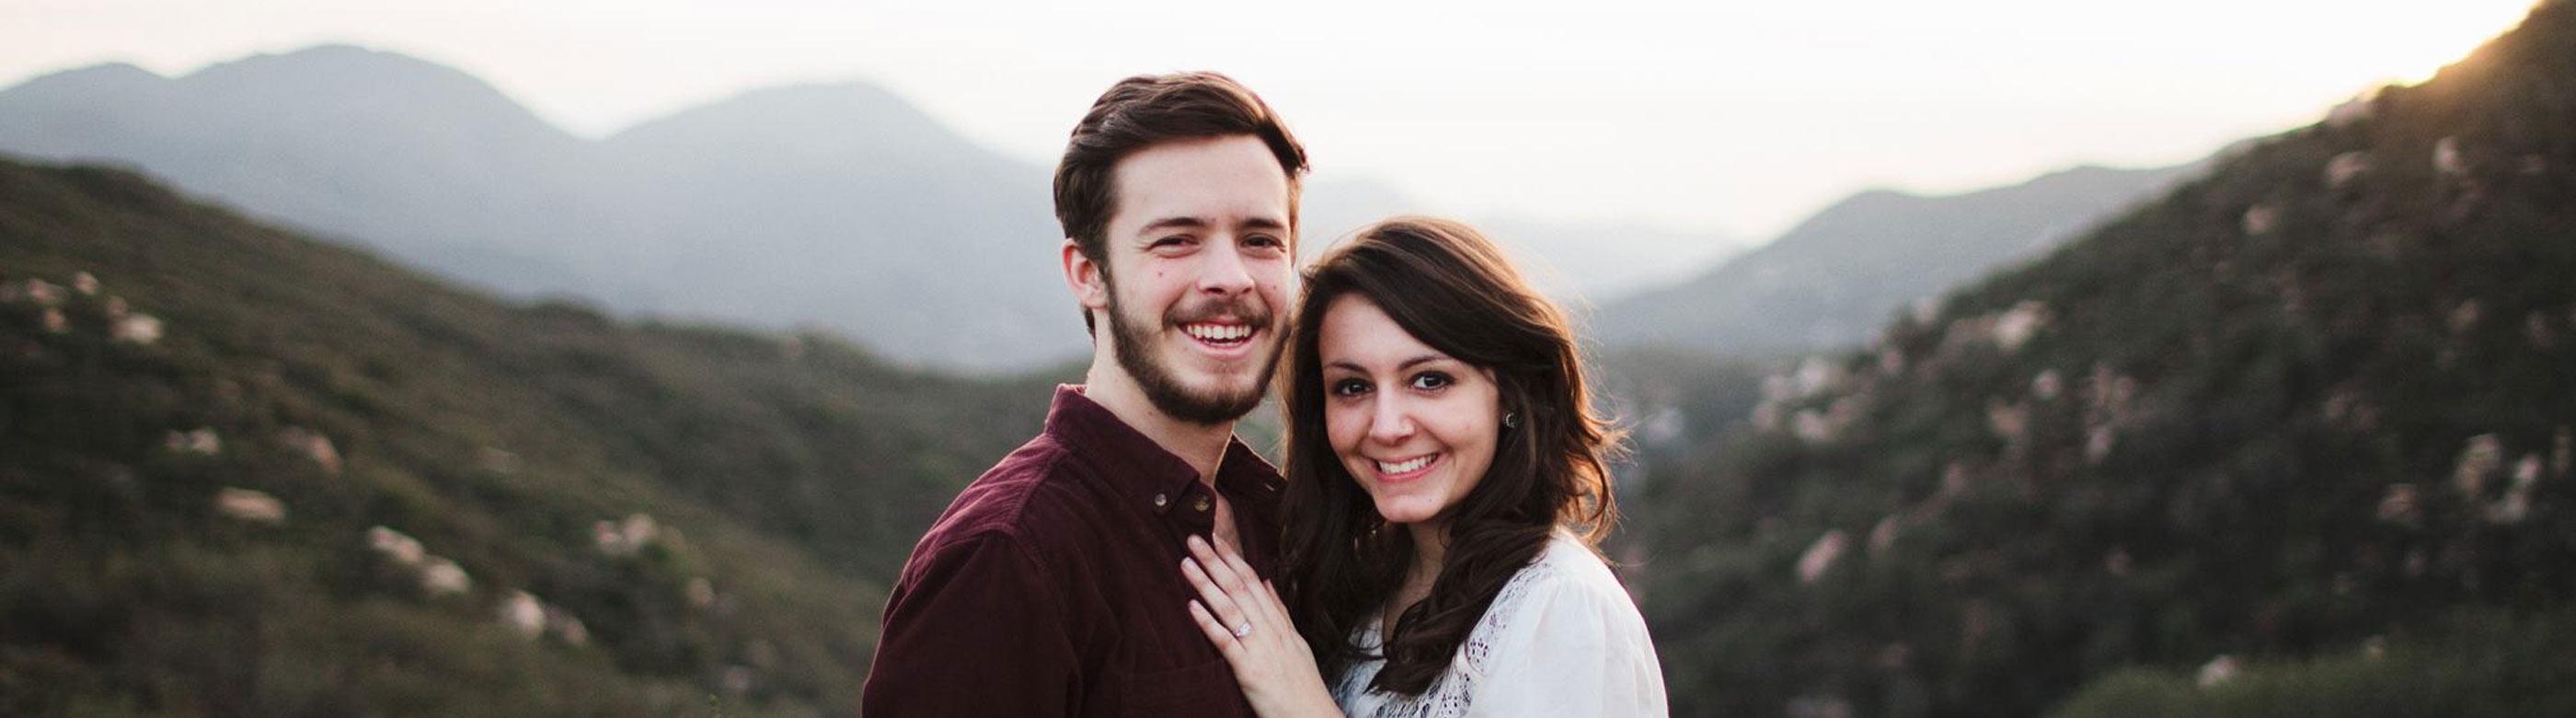 Saddleback Church Ministries Premarital Counseling